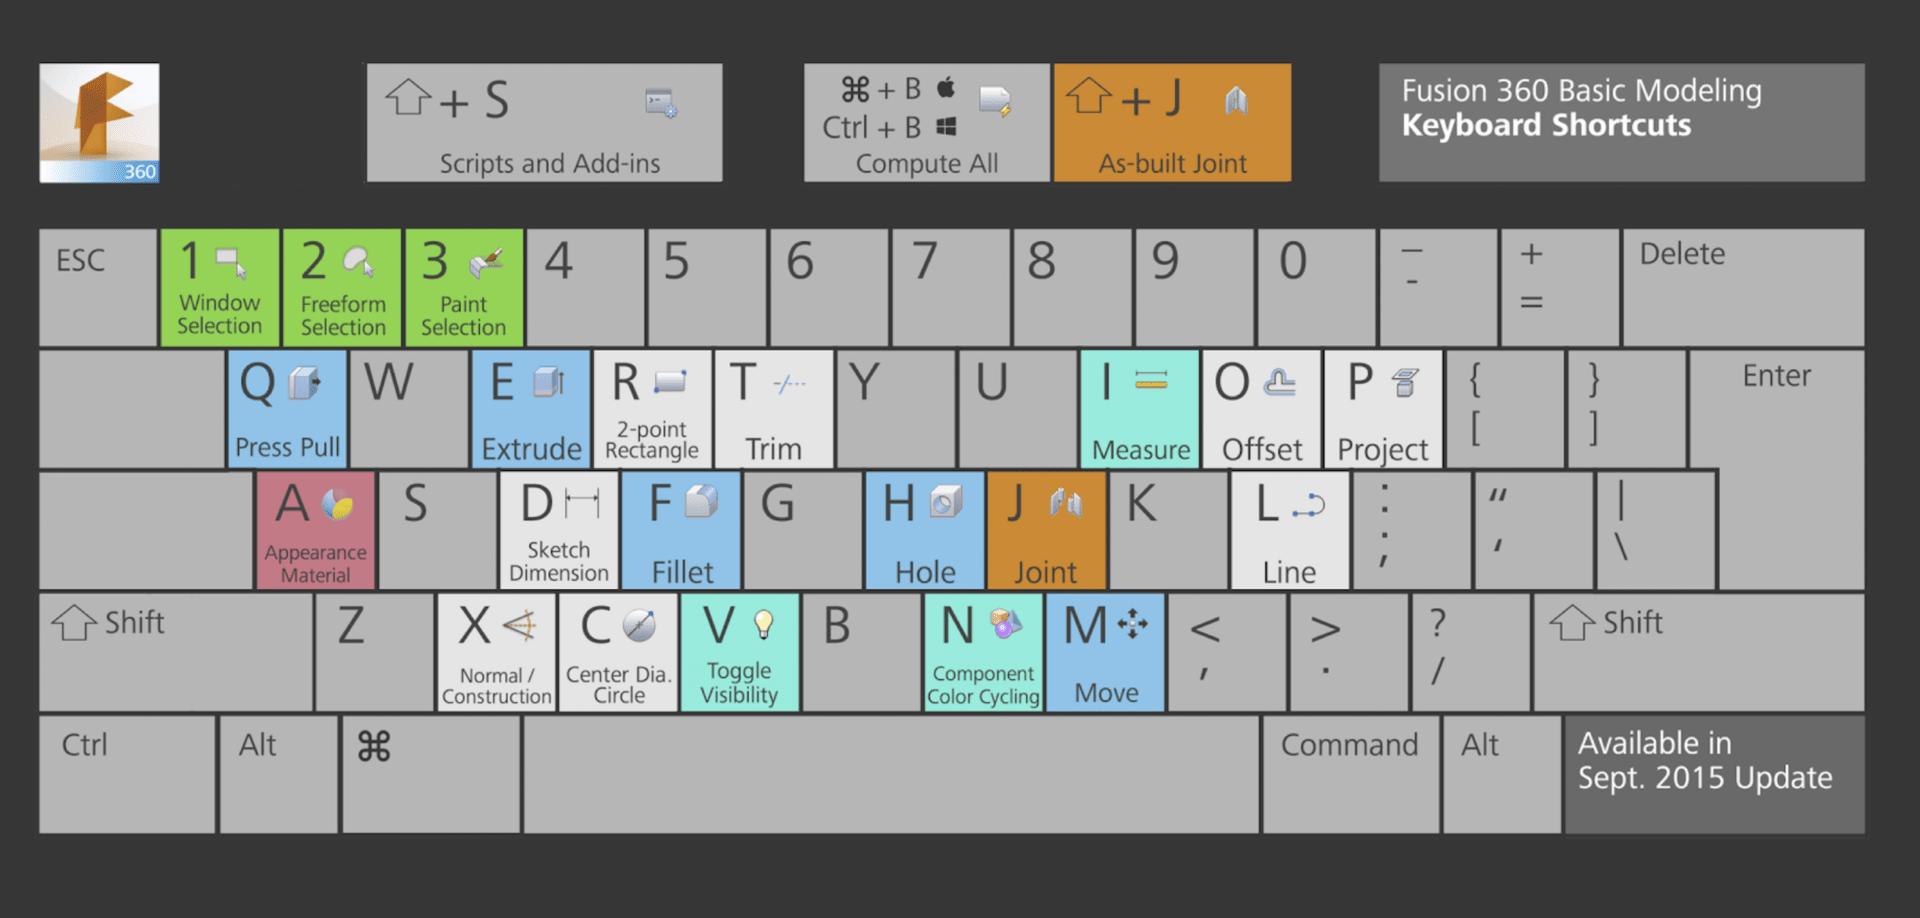 fusion 360 shortcut keys pdf